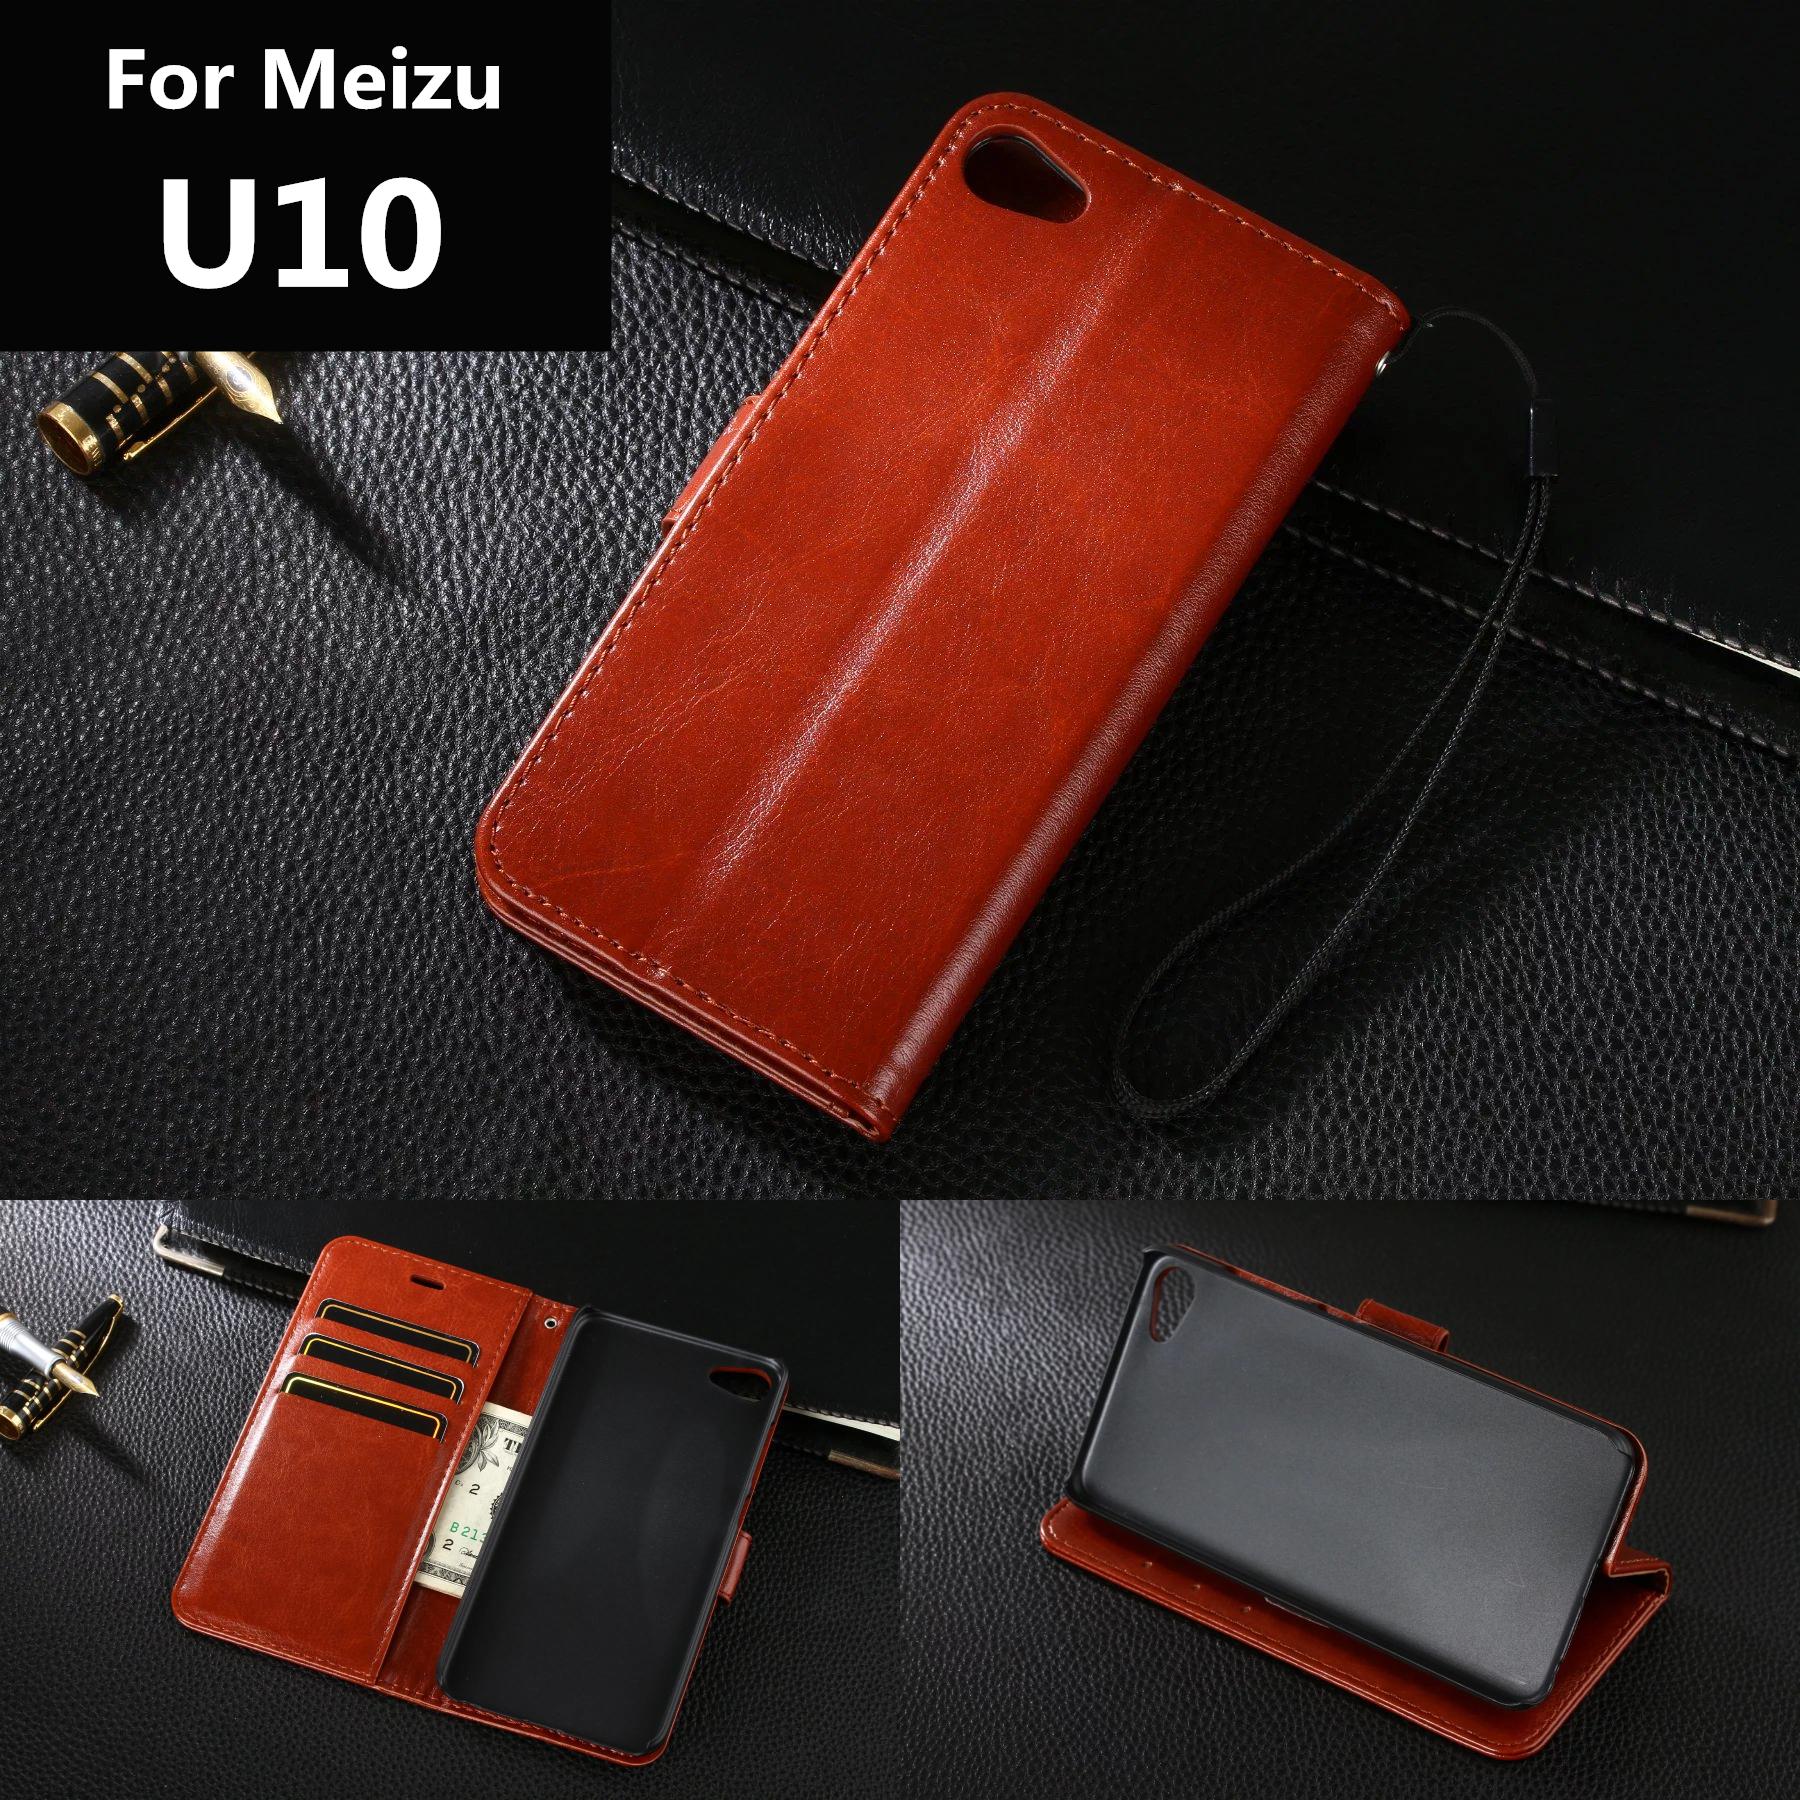 Meizu U10 card holder cover case for Meizu U10 leather phone case ultra thin wallet flip cover(China (Mainland))